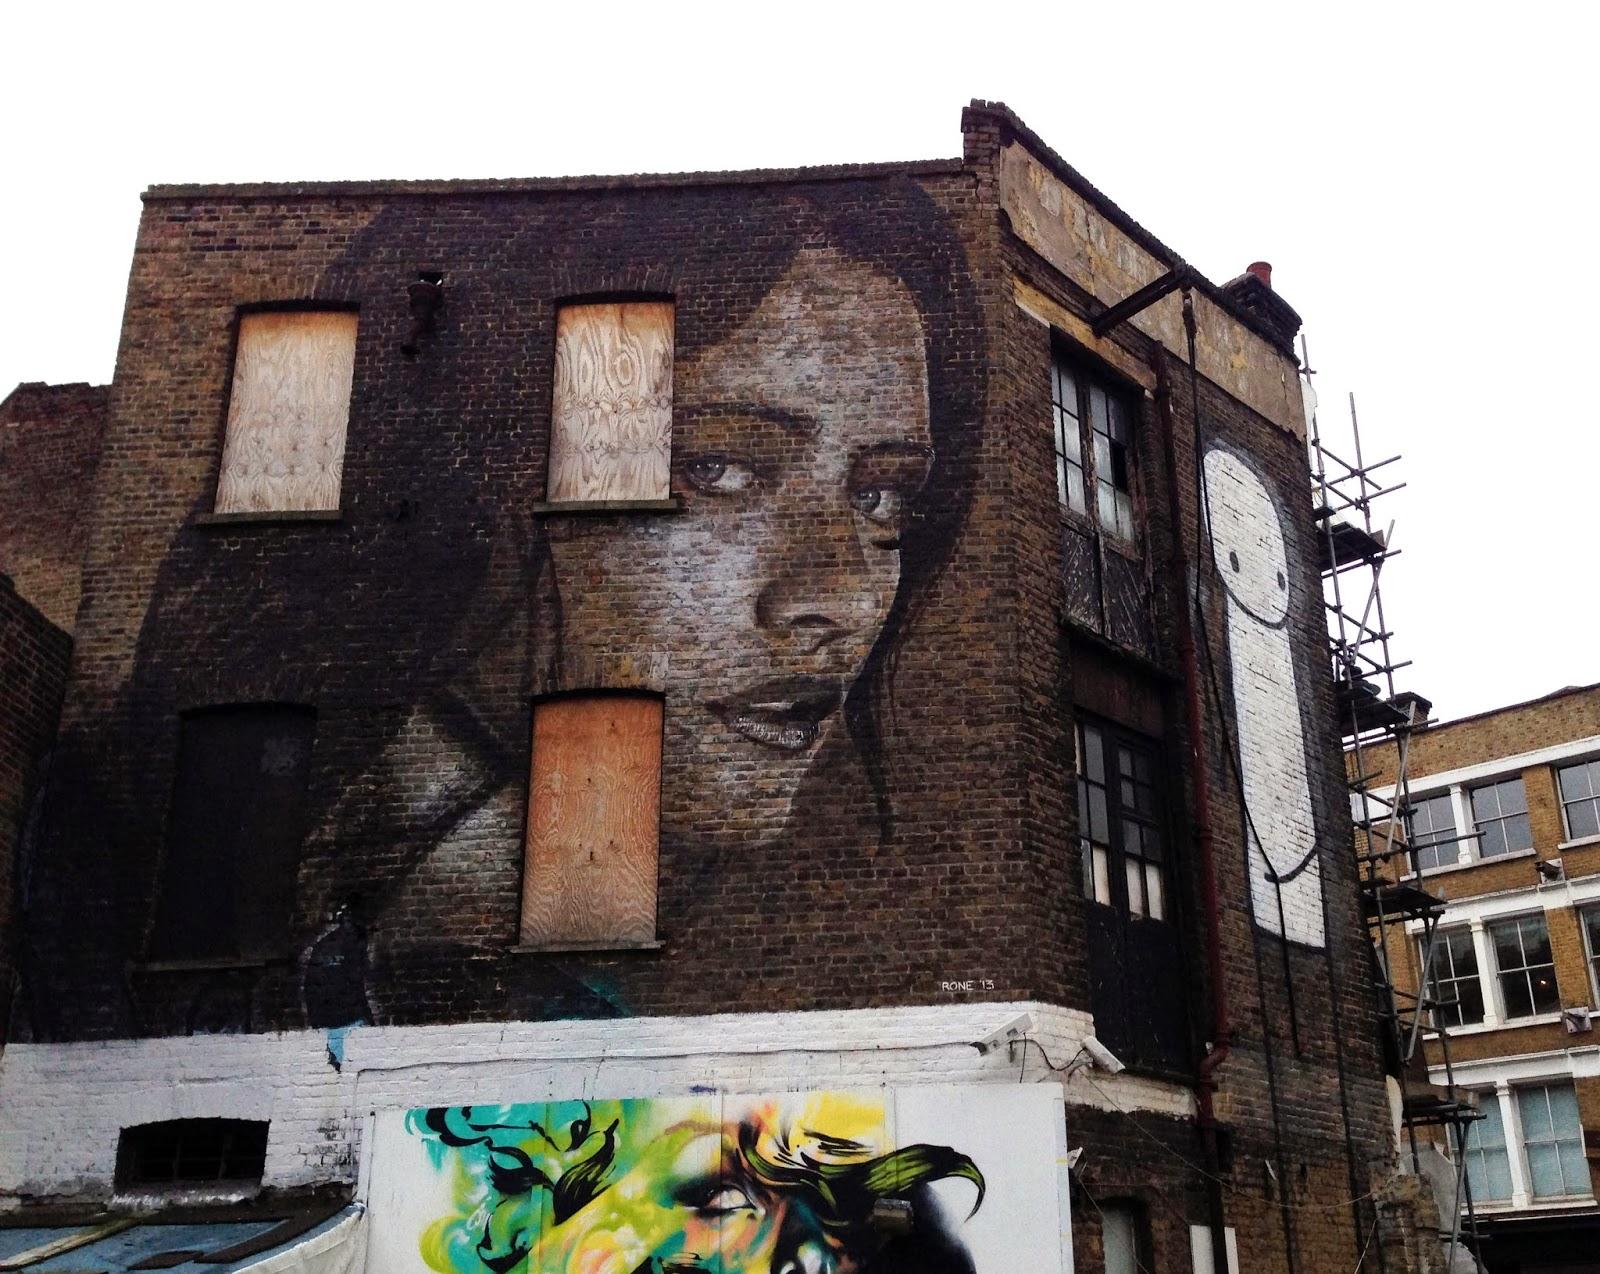 east london street art map rome - photo#1